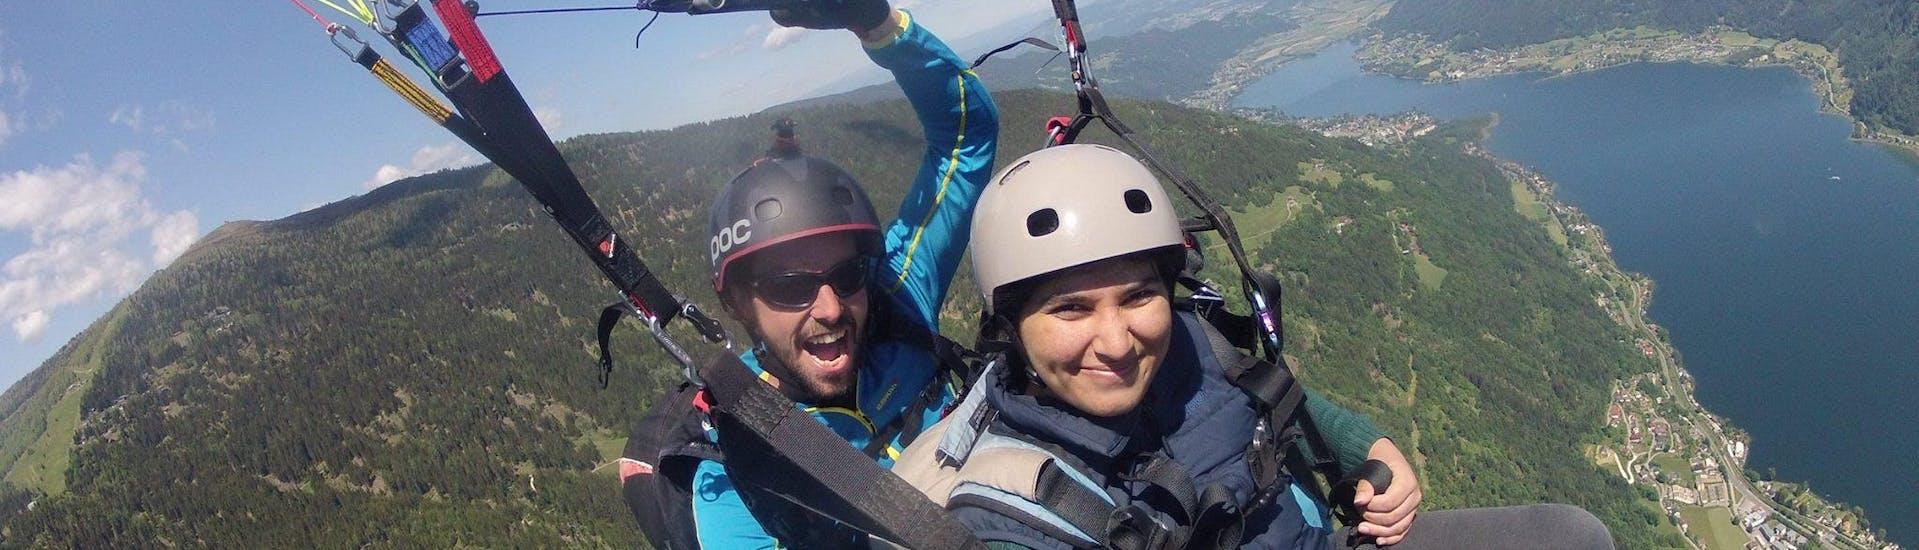 Thermal Tandem Paragliding from Gerlitzen